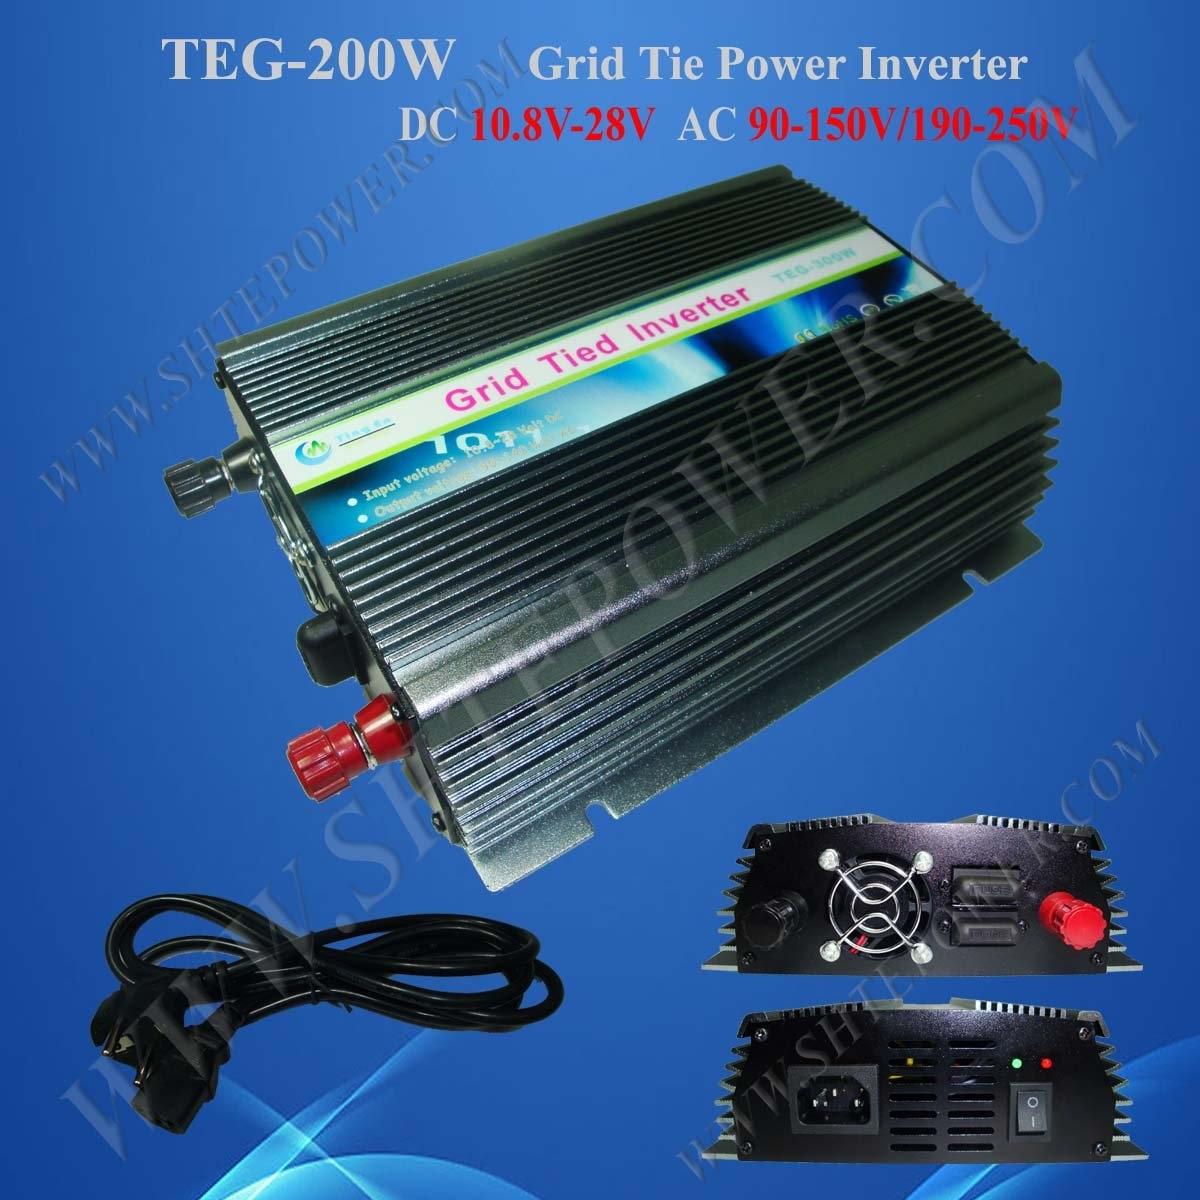 200w grid tie solar inverter 200w on grid tie solar inverter dc 10.8-28v to ac 100v/240v 200w power inverter for solar panel on grid system dc 10 8v 28v to ac 90v 150v one year warranty high quality